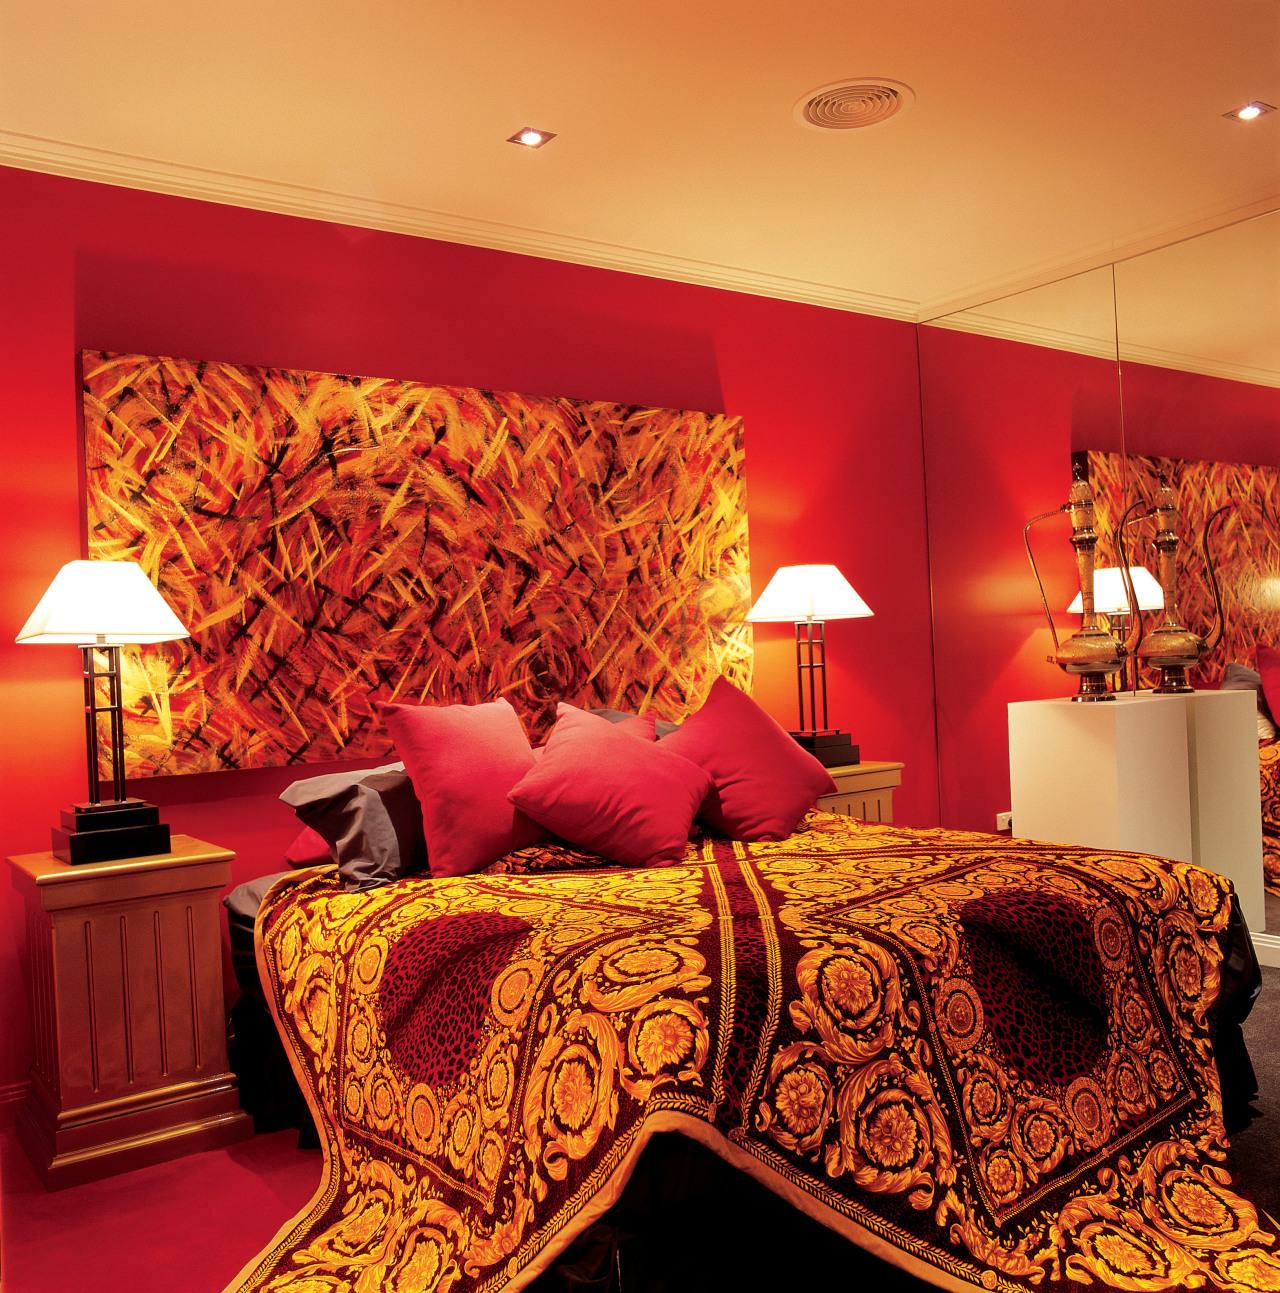 View of this bedroom bed sheet, bedroom, ceiling, interior design, modern art, orange, room, suite, wall, red, orange